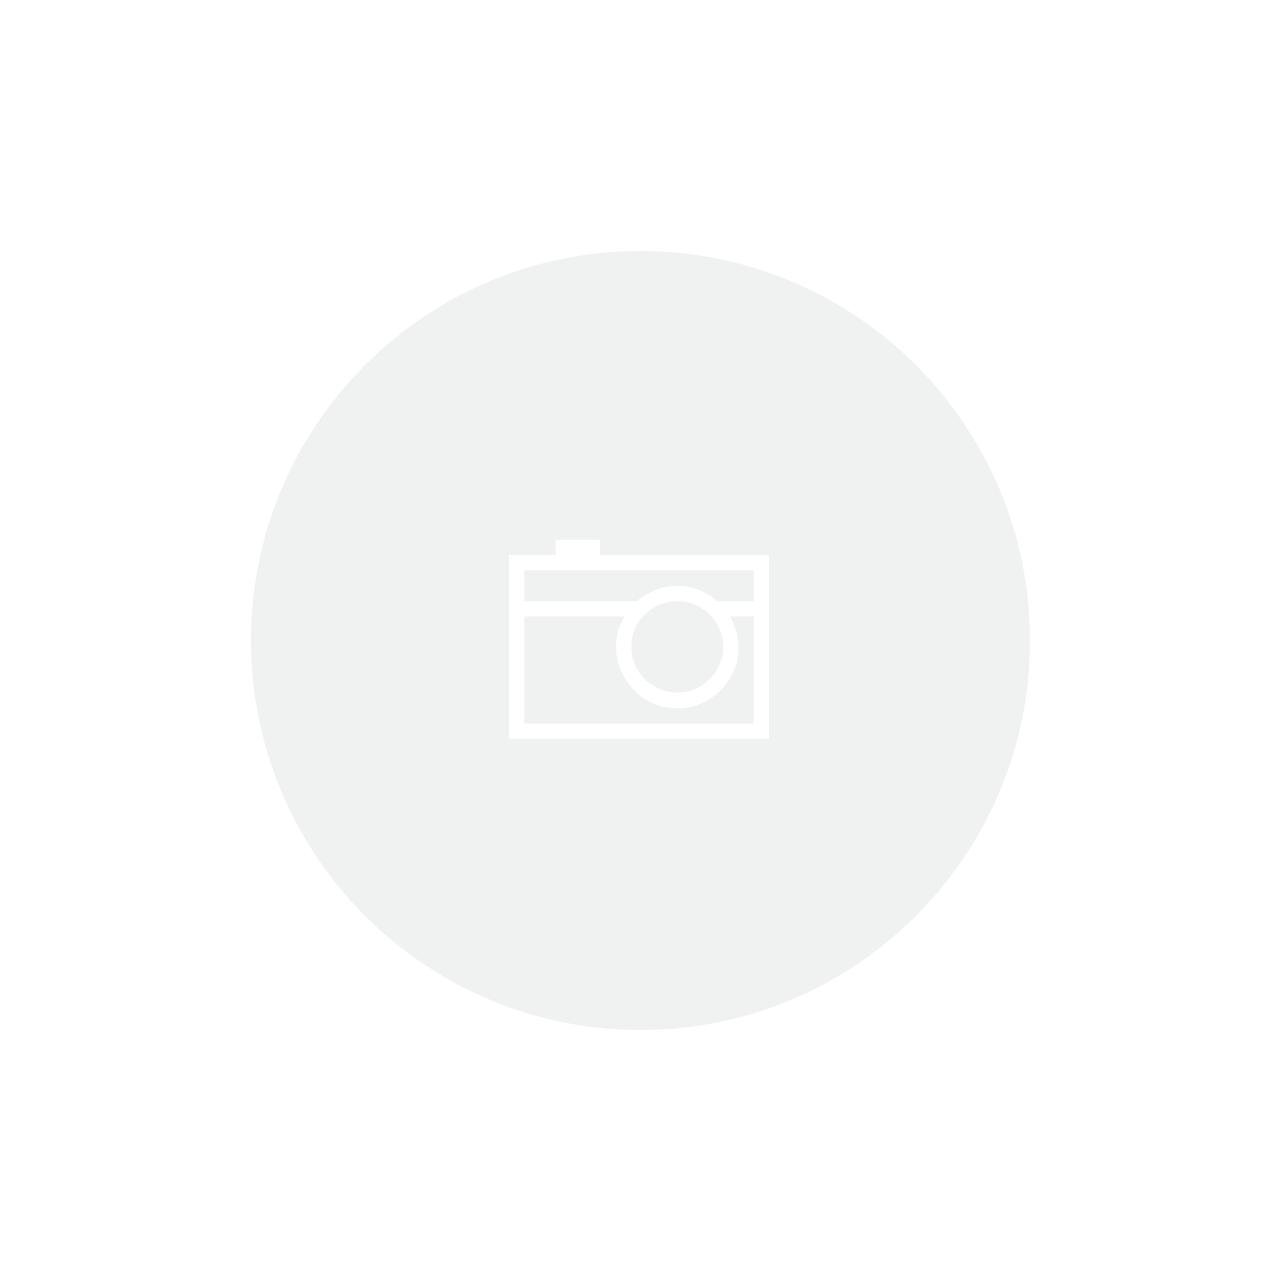 CADEADO ESPIRAL 10mm X 60Cm ELLEVEN C/ SUPORTE